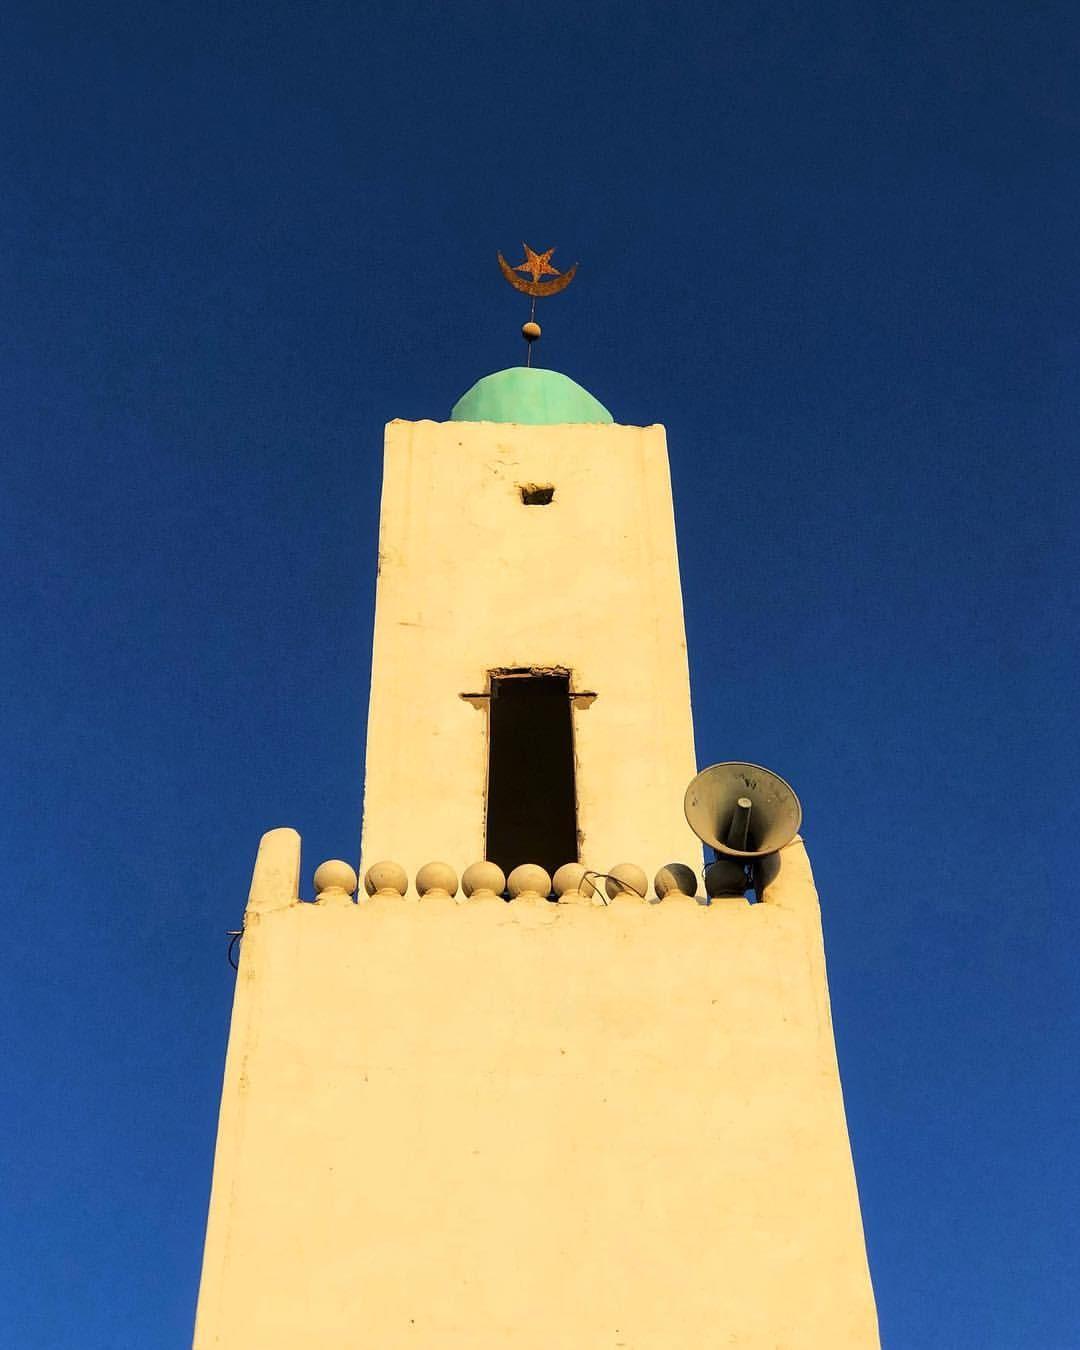 Nouakchott Mauritania Minaret At Sunset Mauritania Nouakchott Mosque Minaret Islamicarchitecture Sunset Nouakchott Mauritania Islamic Architecture